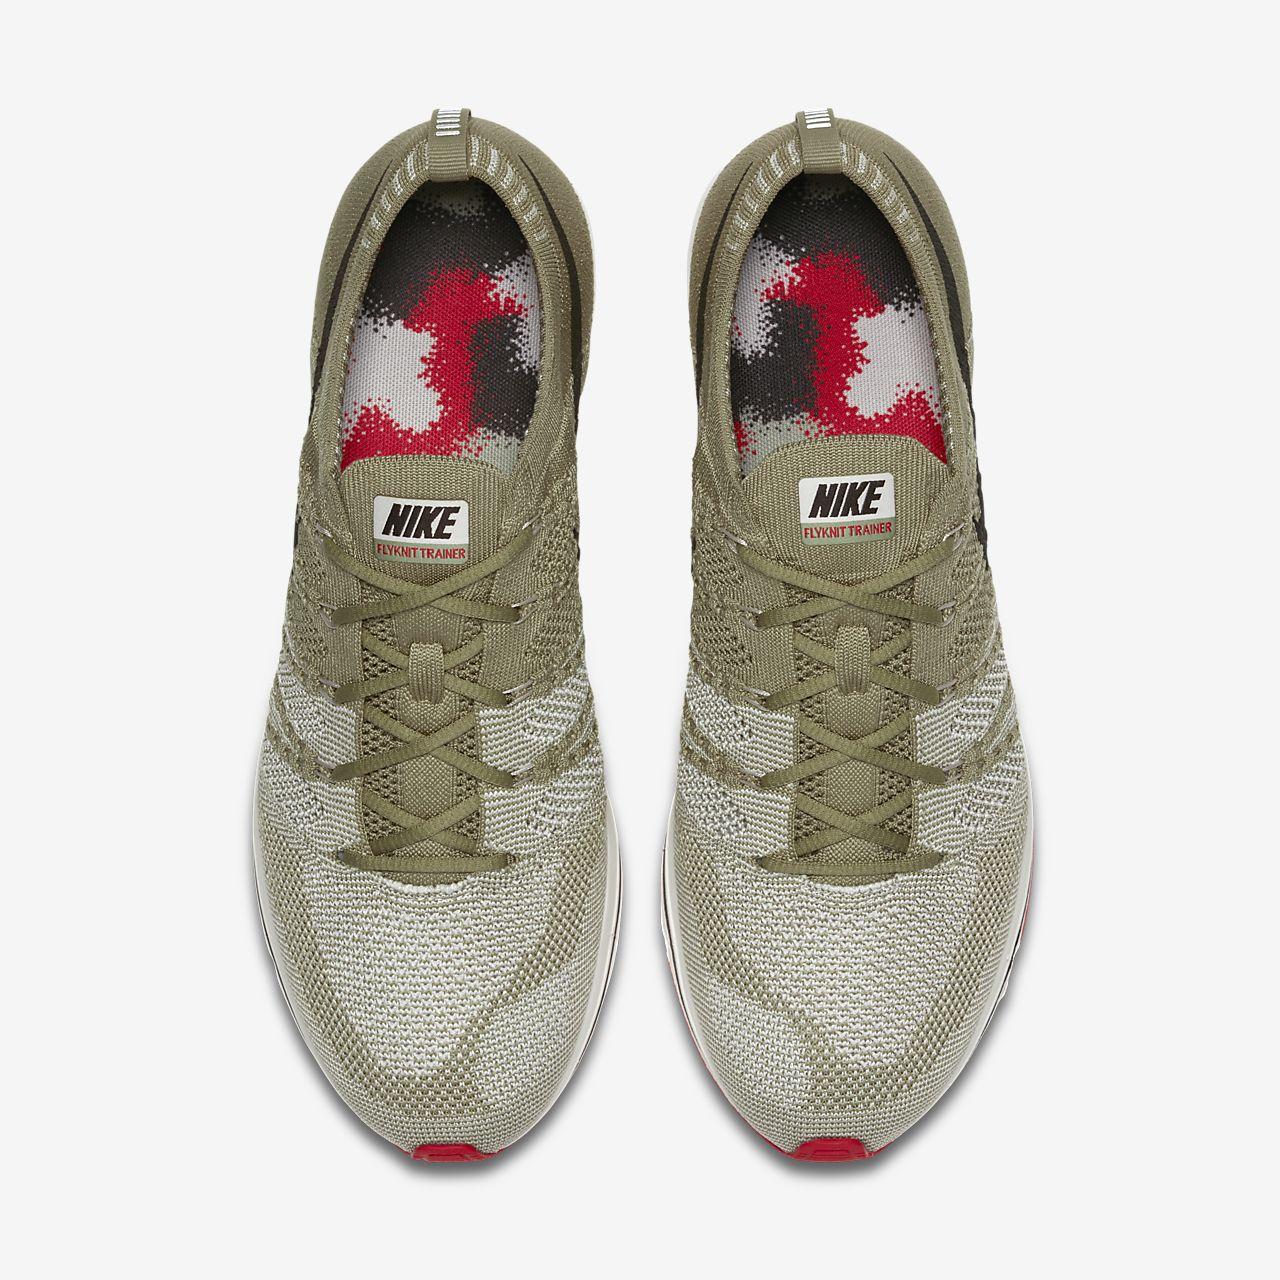 promo code fc265 59567 ... Nike Flyknit Trainer Unisex Shoe